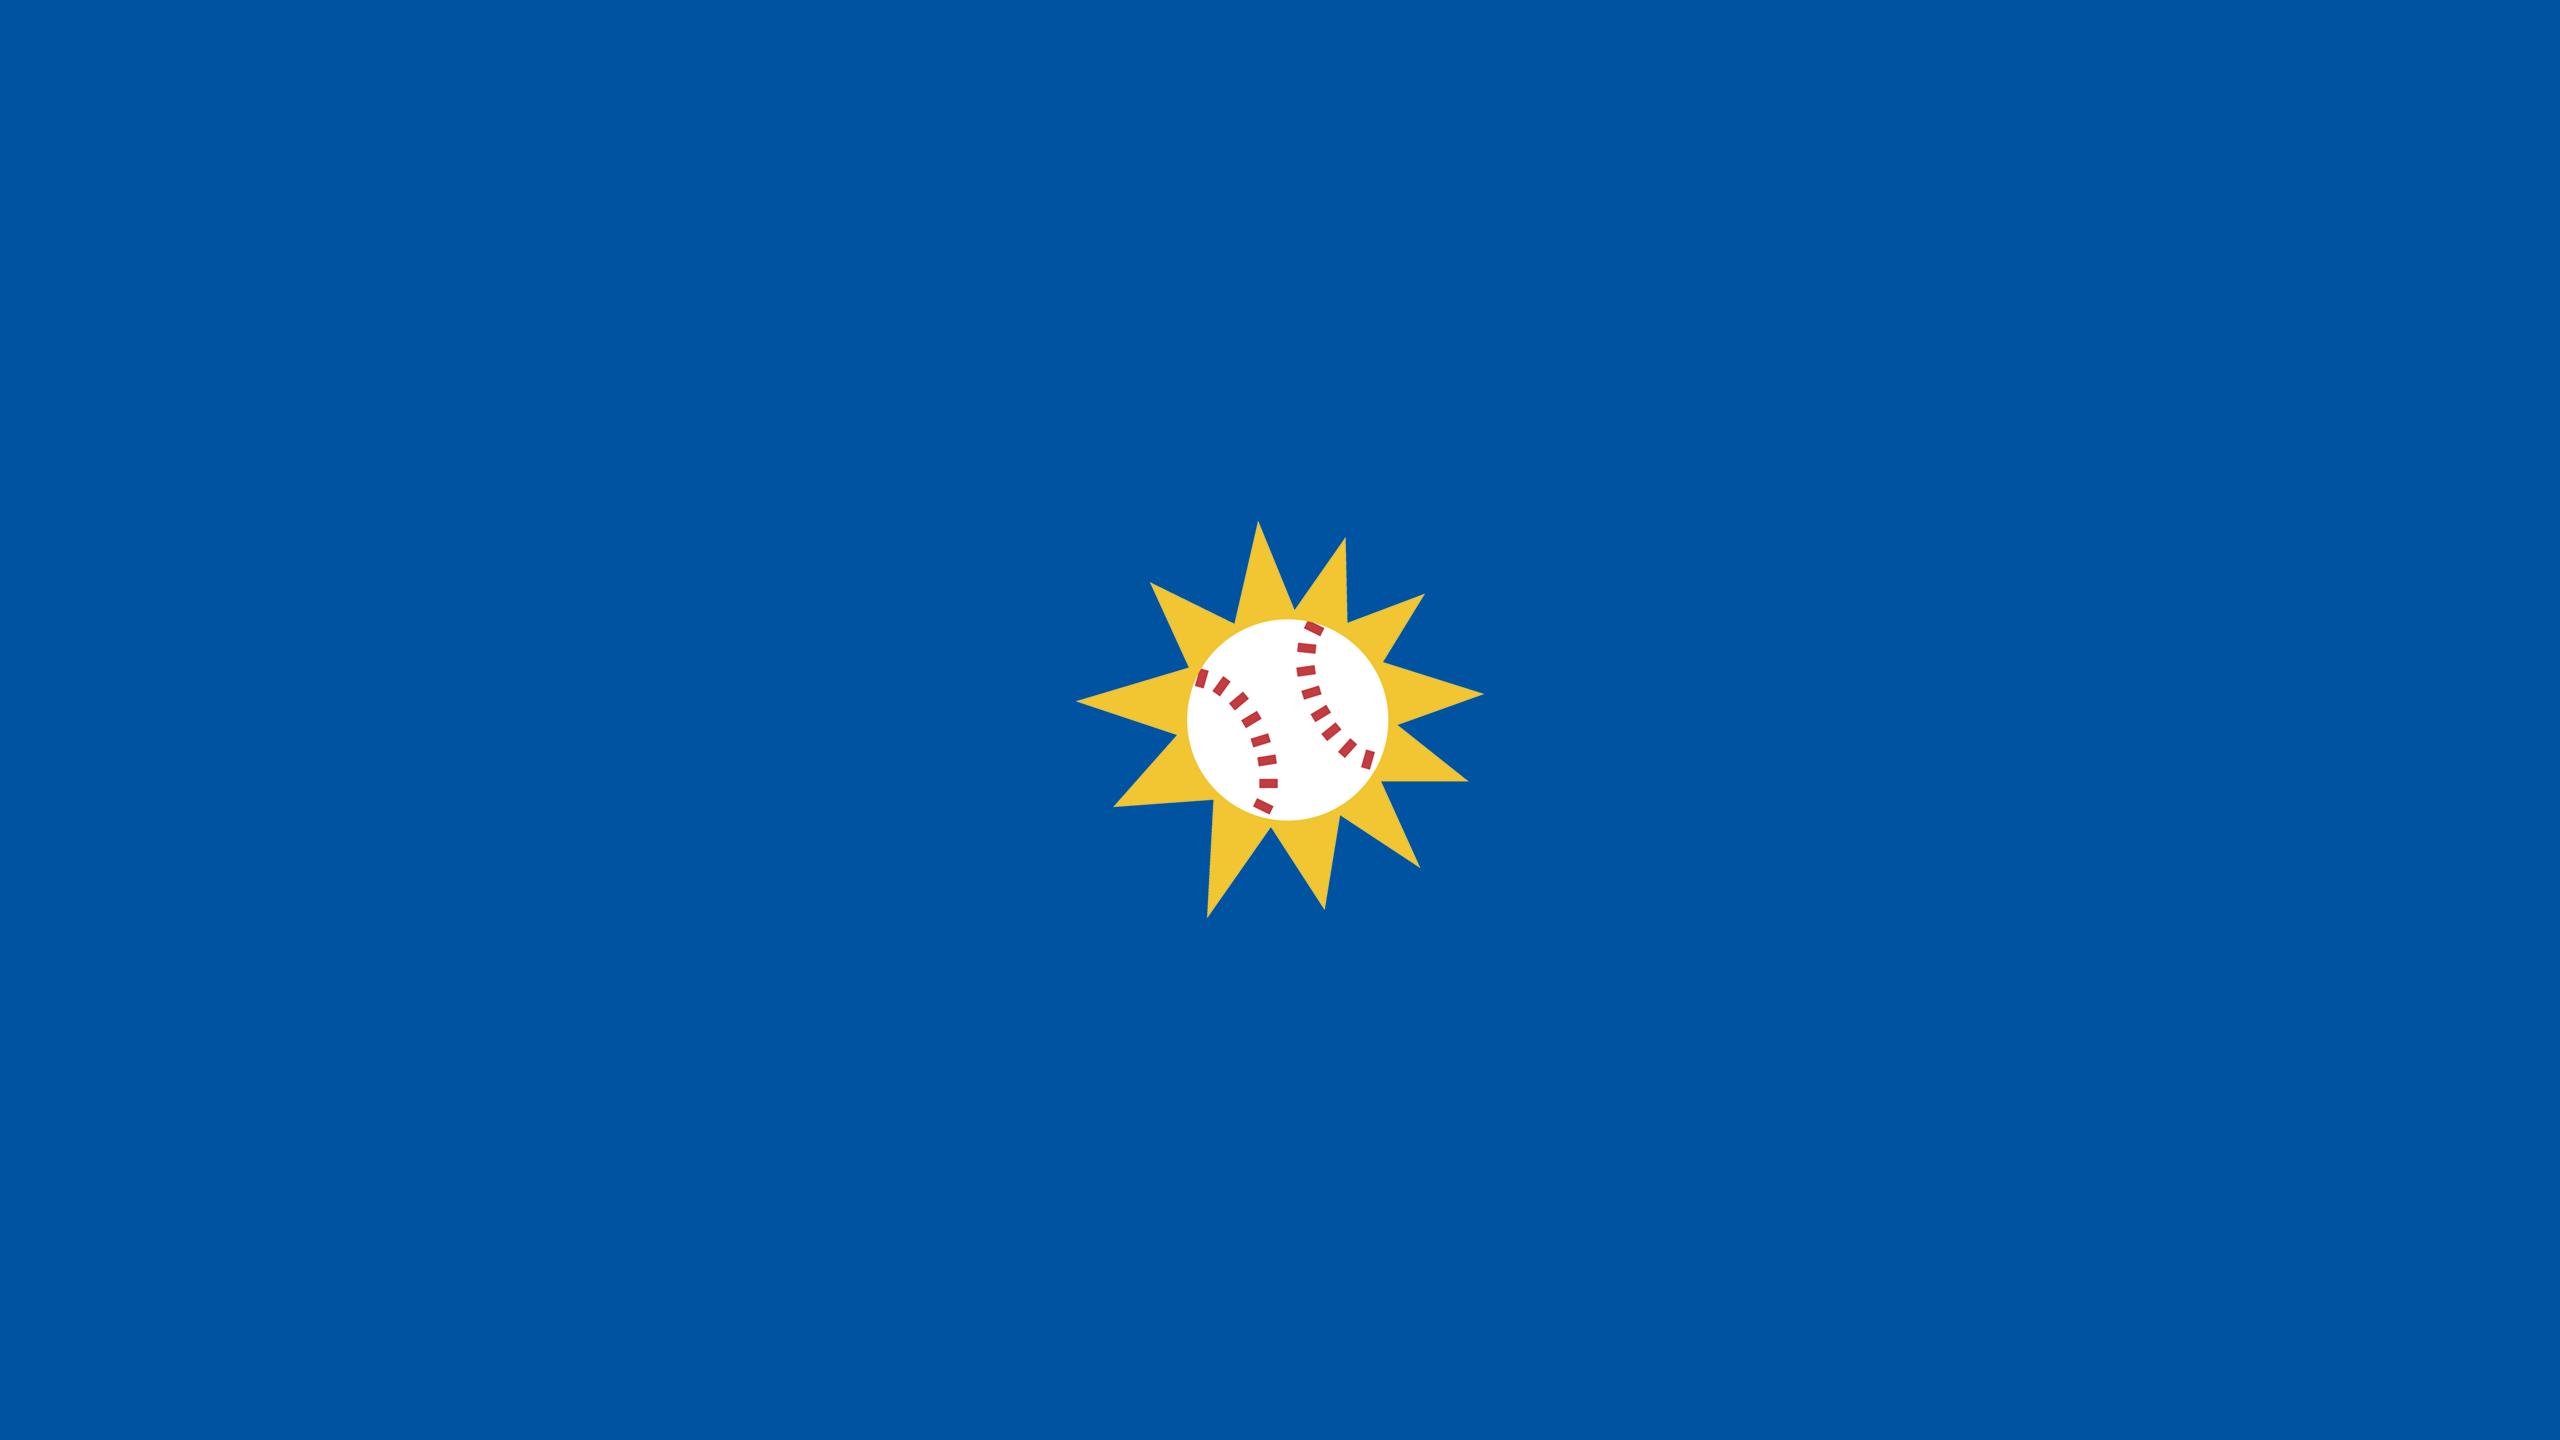 Jacksonville (FL) Suns